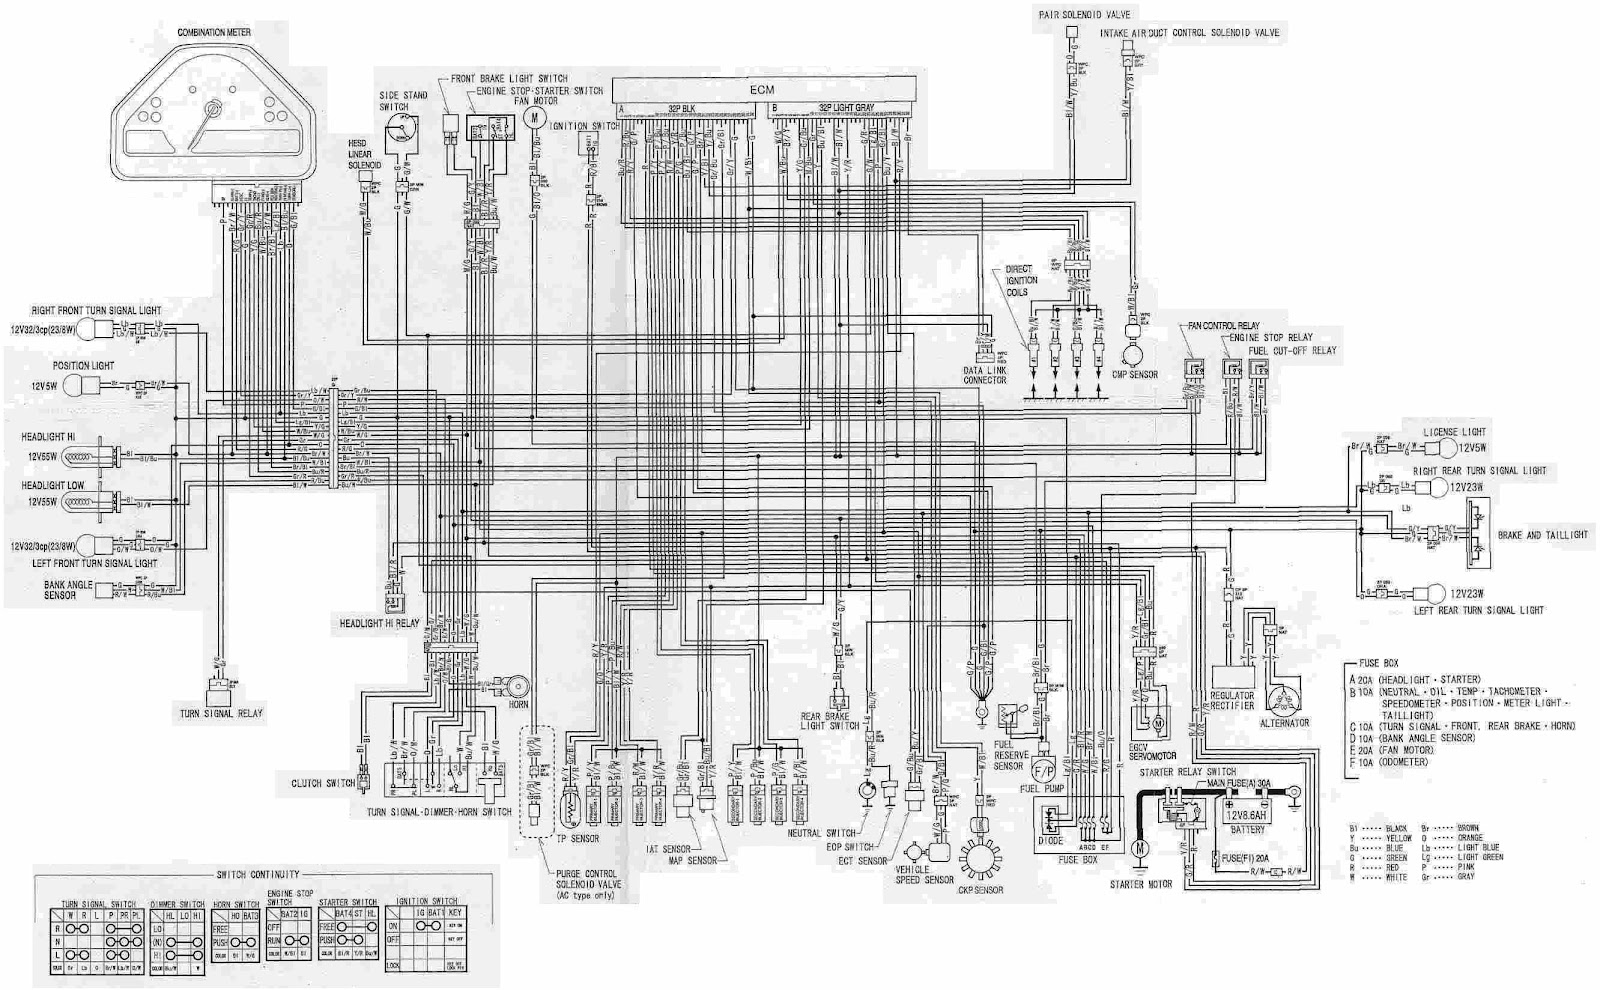 2004 rancher wiring diagrams wiring library rh 66 codingcommunity de rancher 2004 honda plasticsinstallation 2006 honda rancher parts diagram [ 1600 x 990 Pixel ]